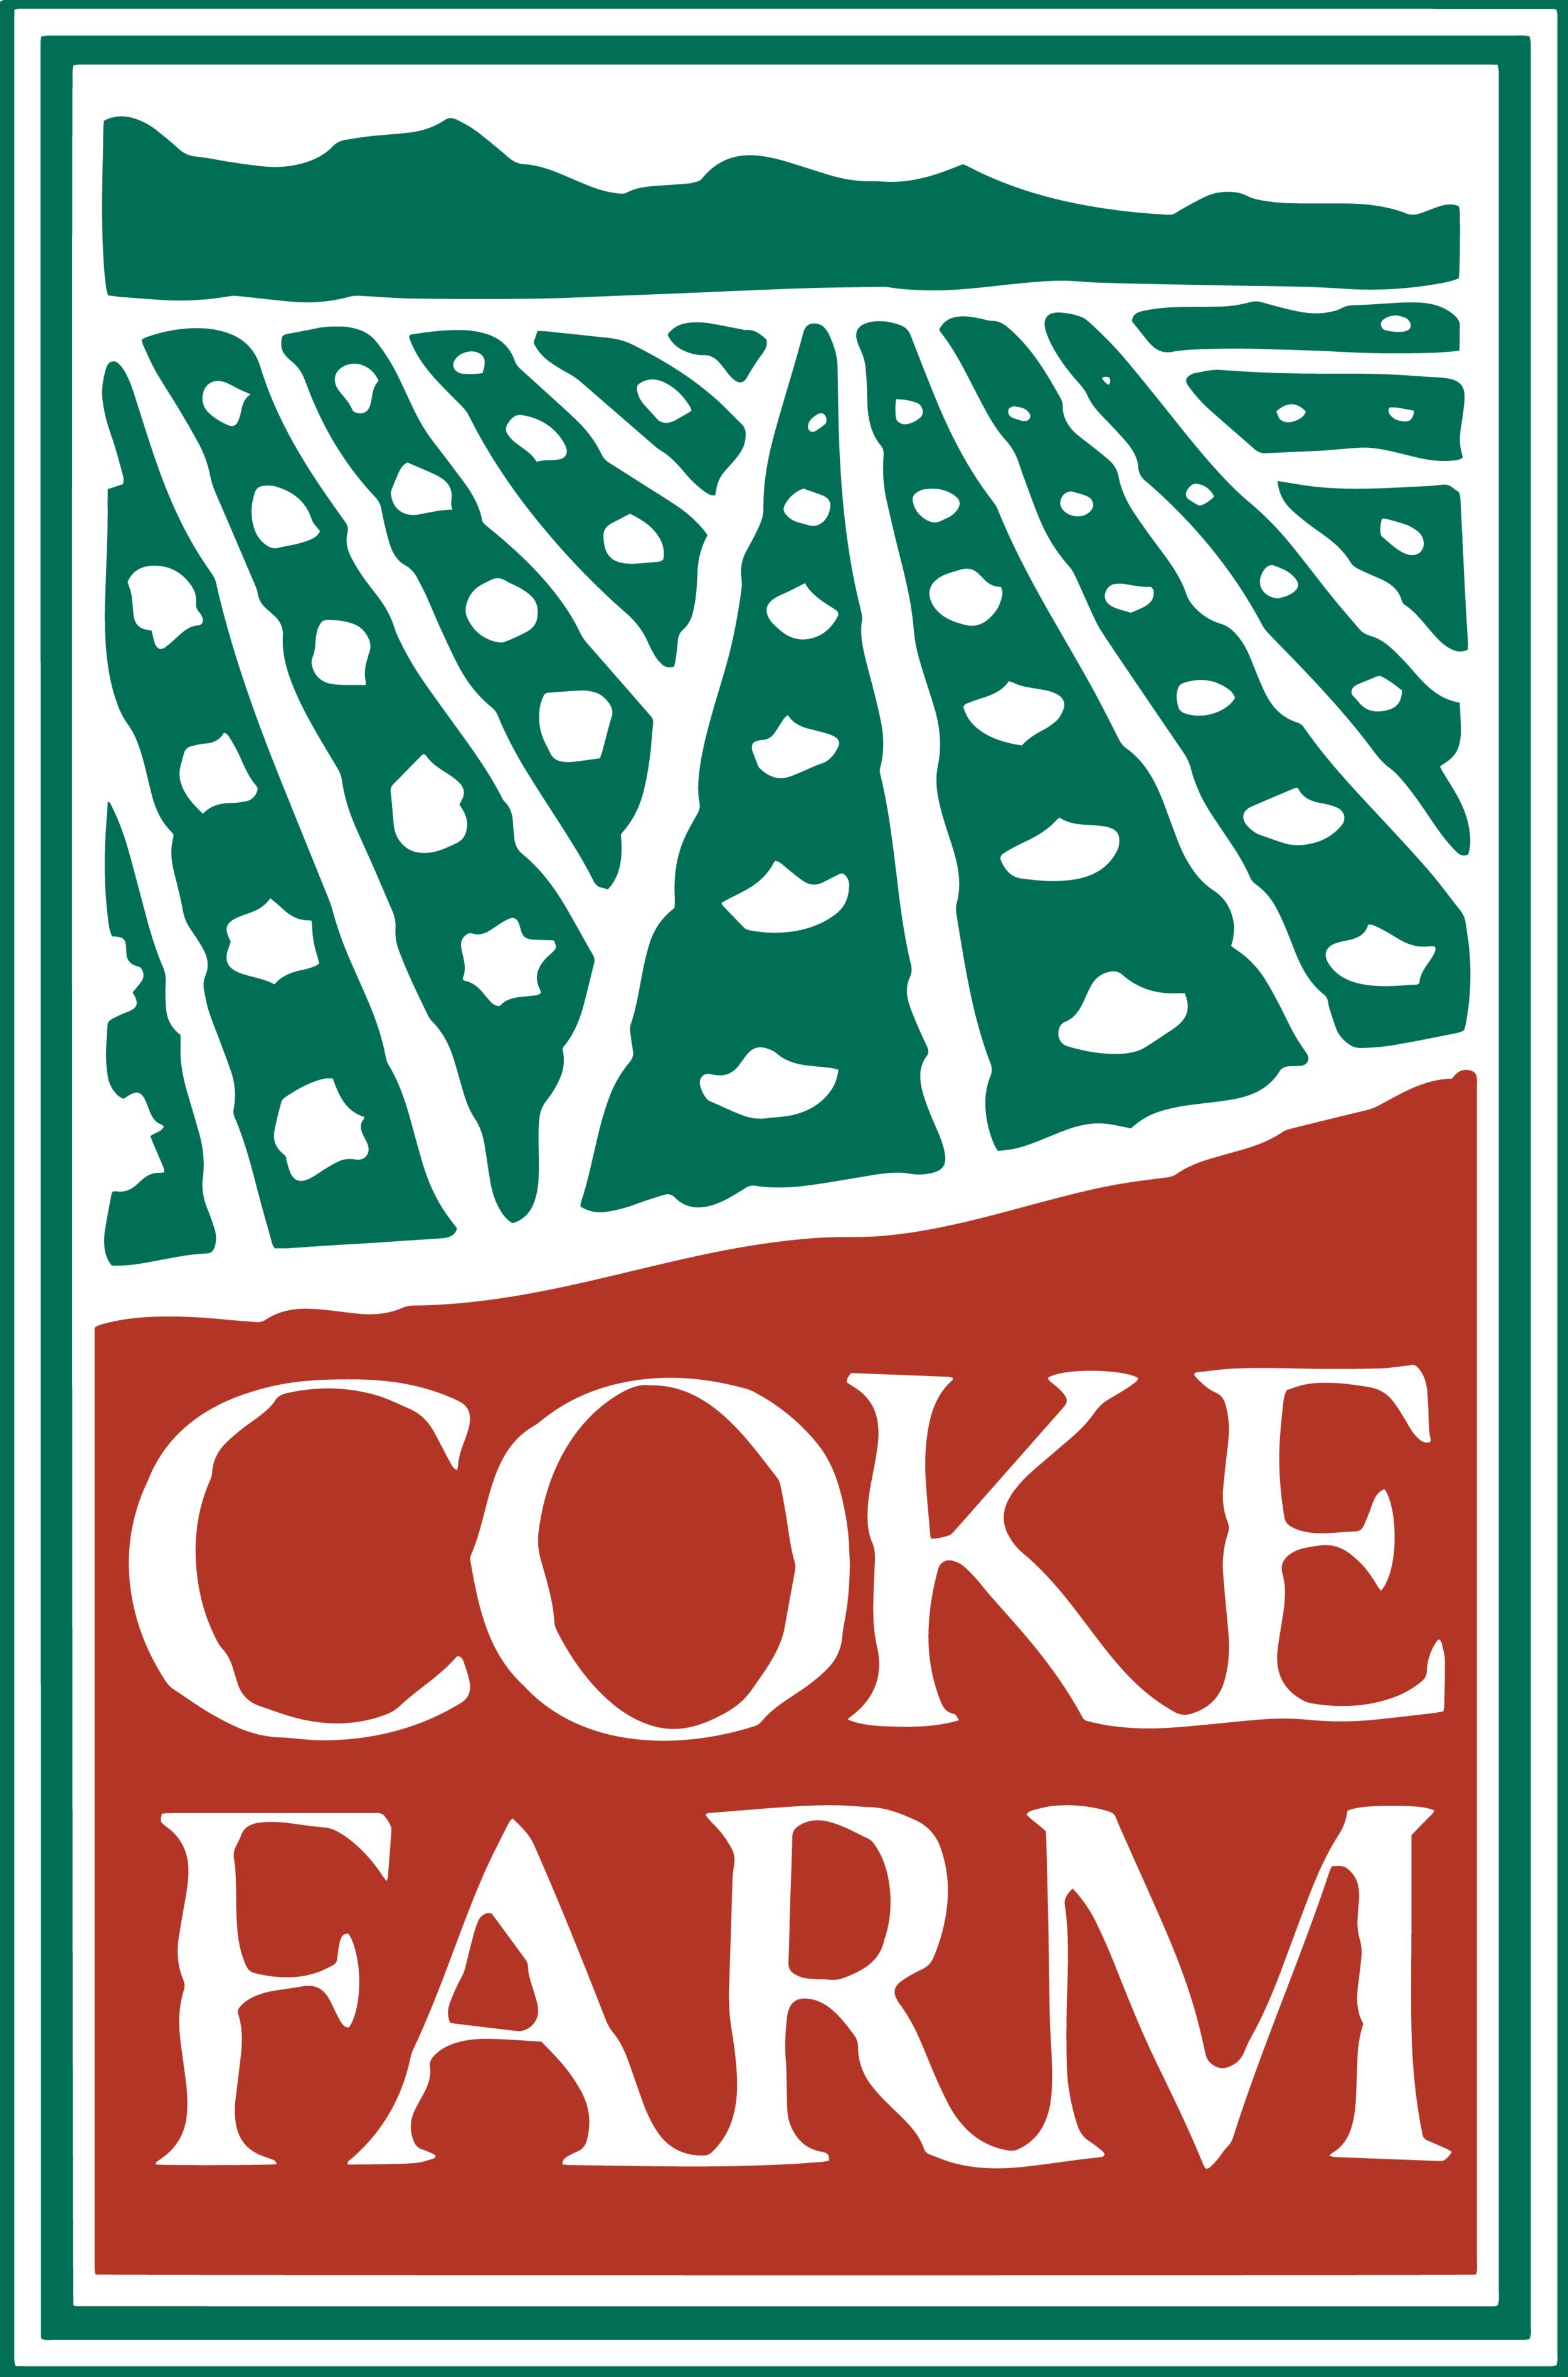 Coke-Logo-large[1].png